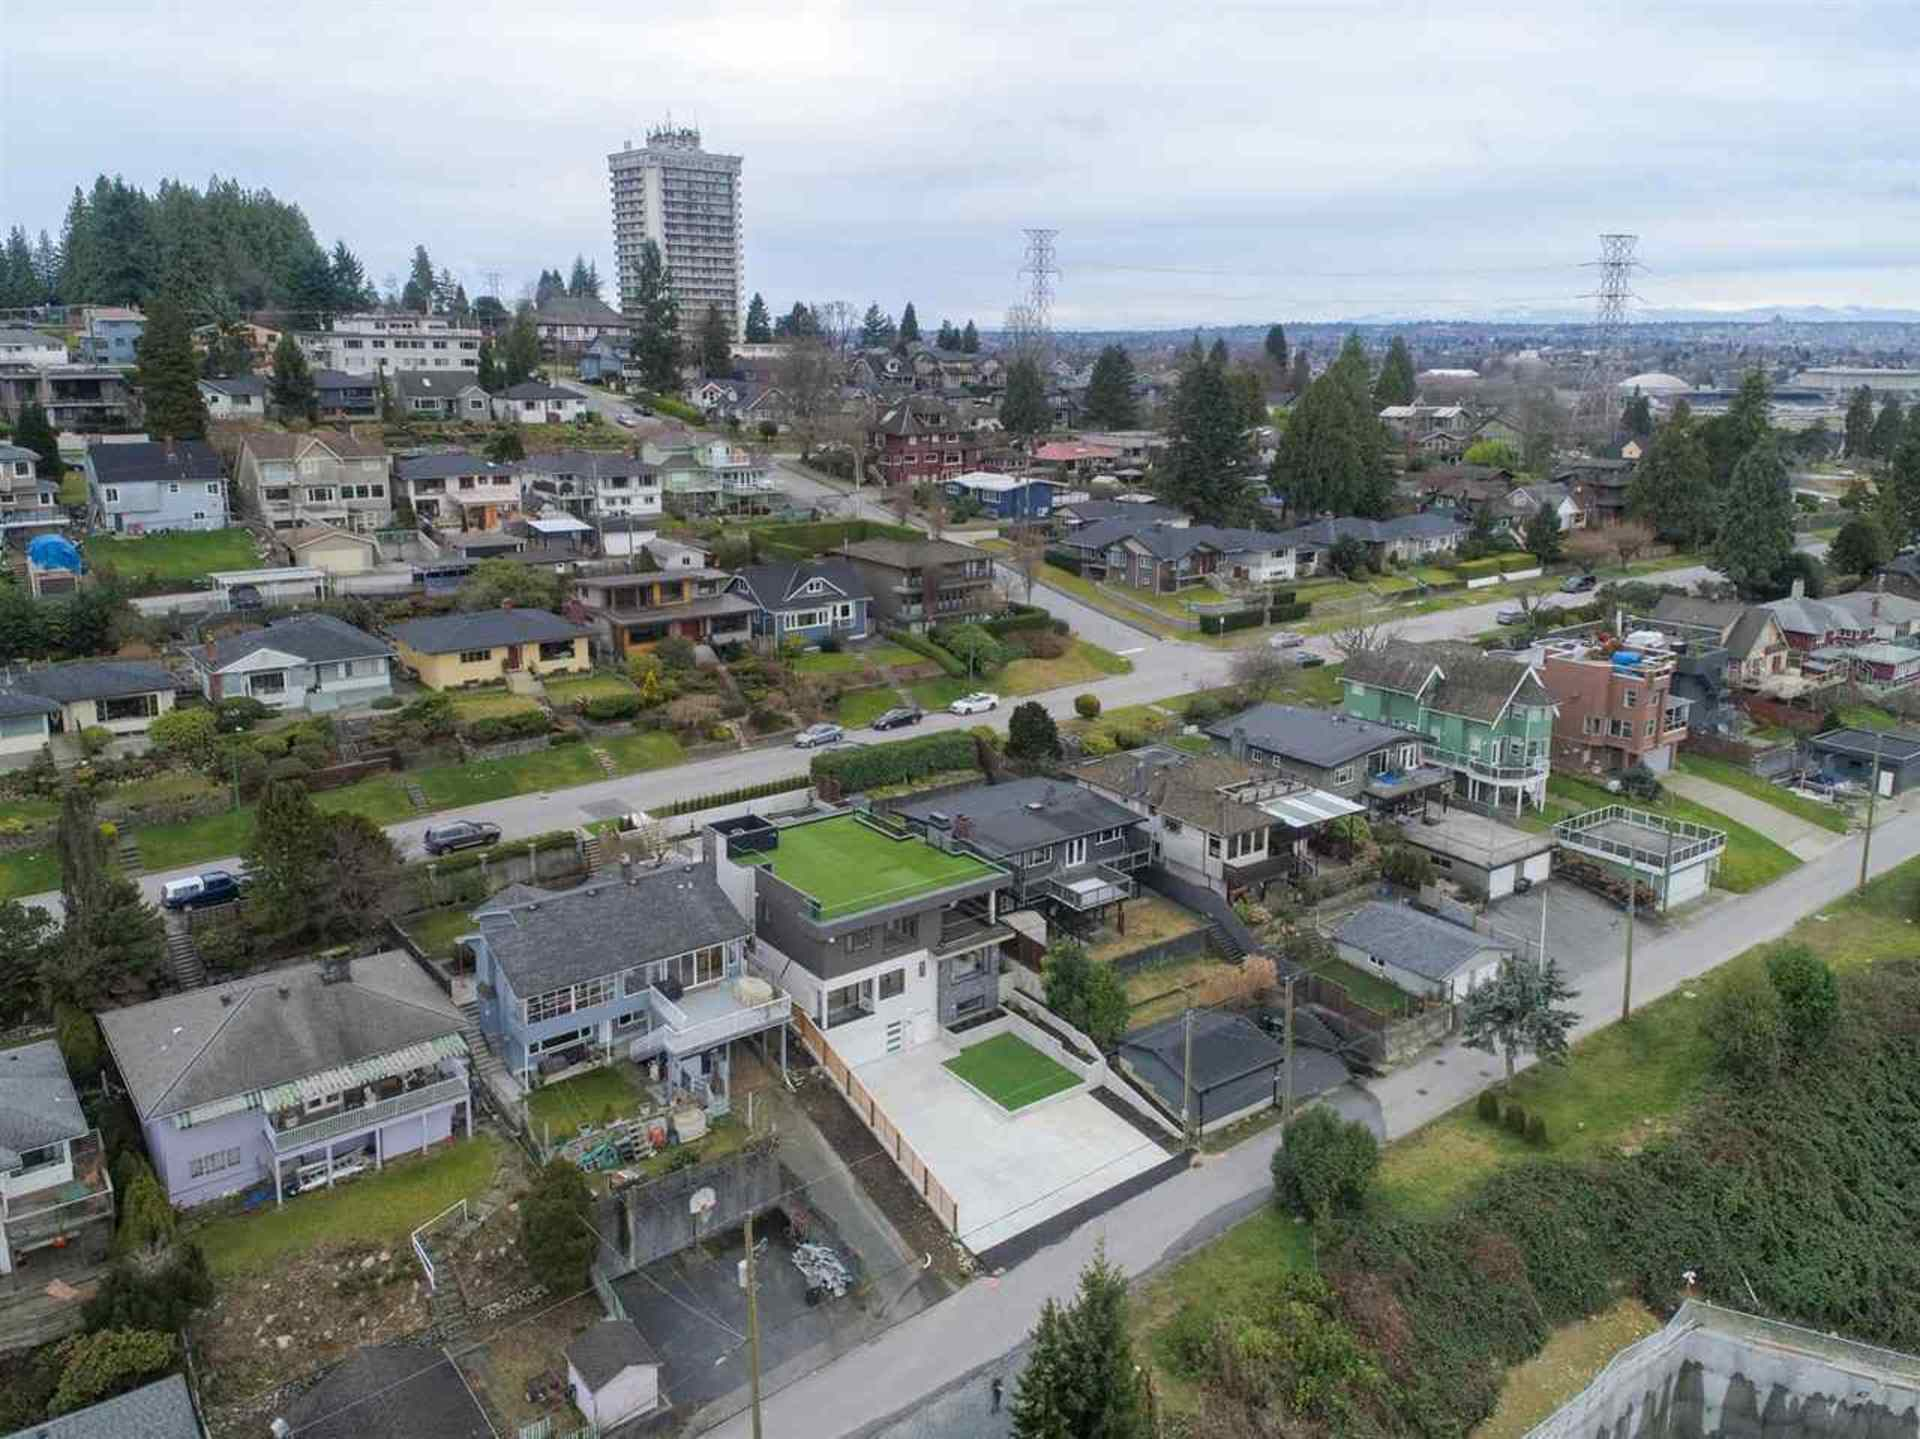 3831-edinburgh-street-vancouver-heights-burnaby-north-03 of 3831 Edinburgh Street, Vancouver Heights, Burnaby North